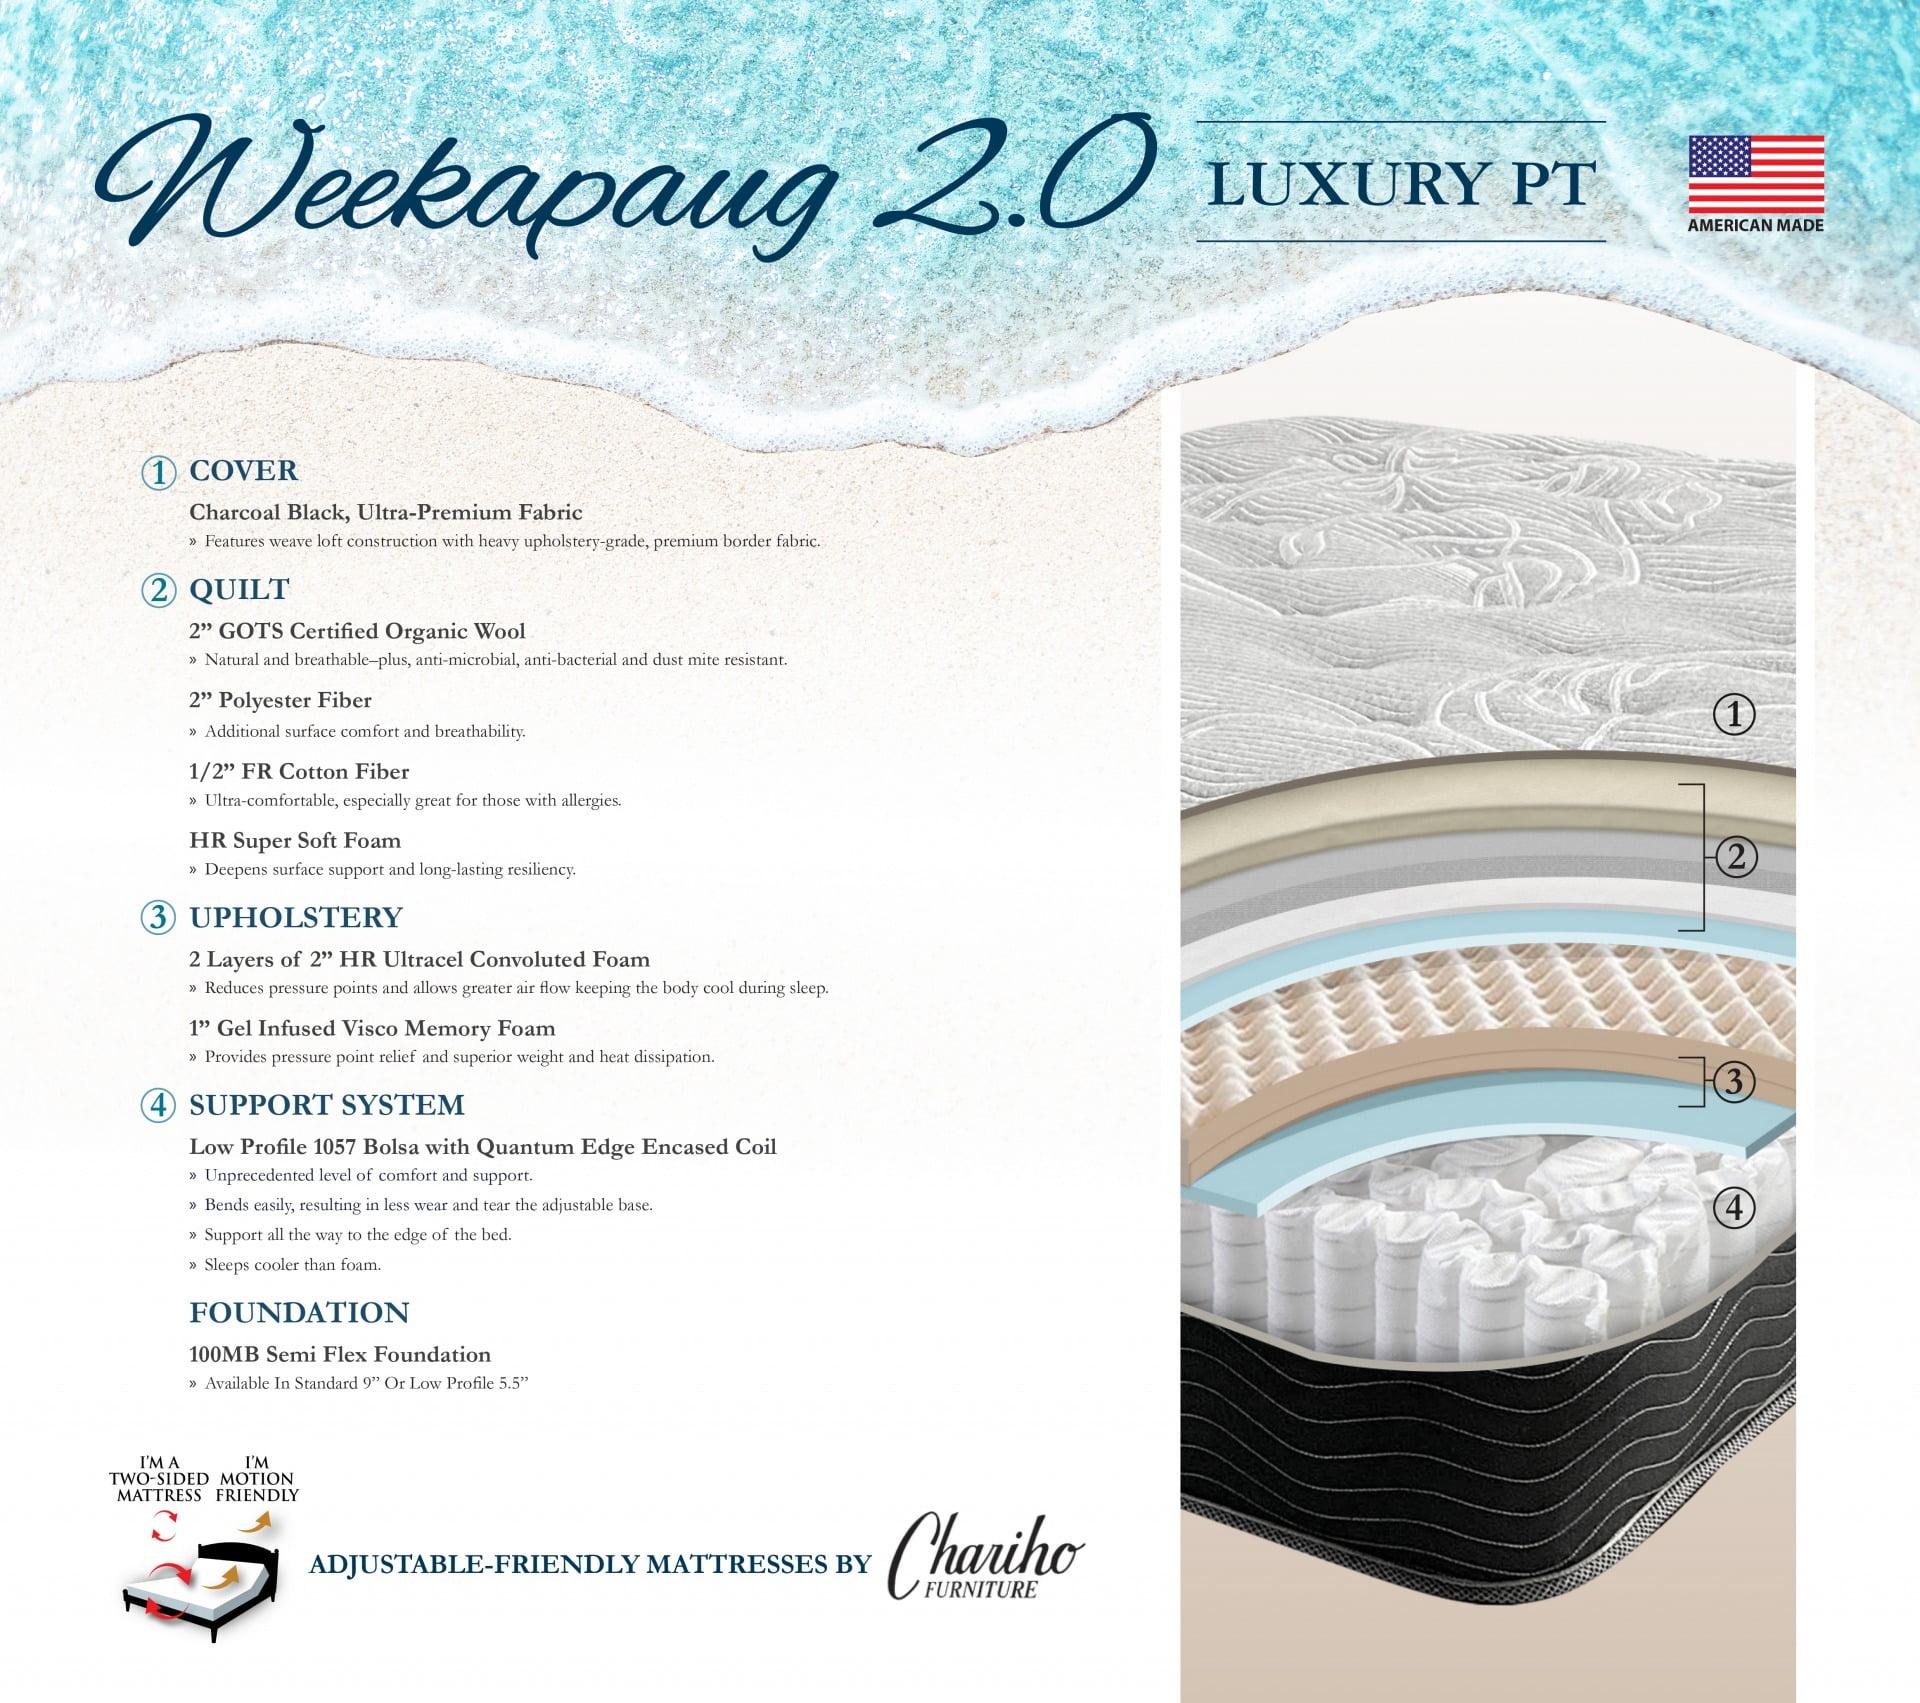 Chariho Furniture AJ Weekapaug 2.0 Luxury PT Spec Card